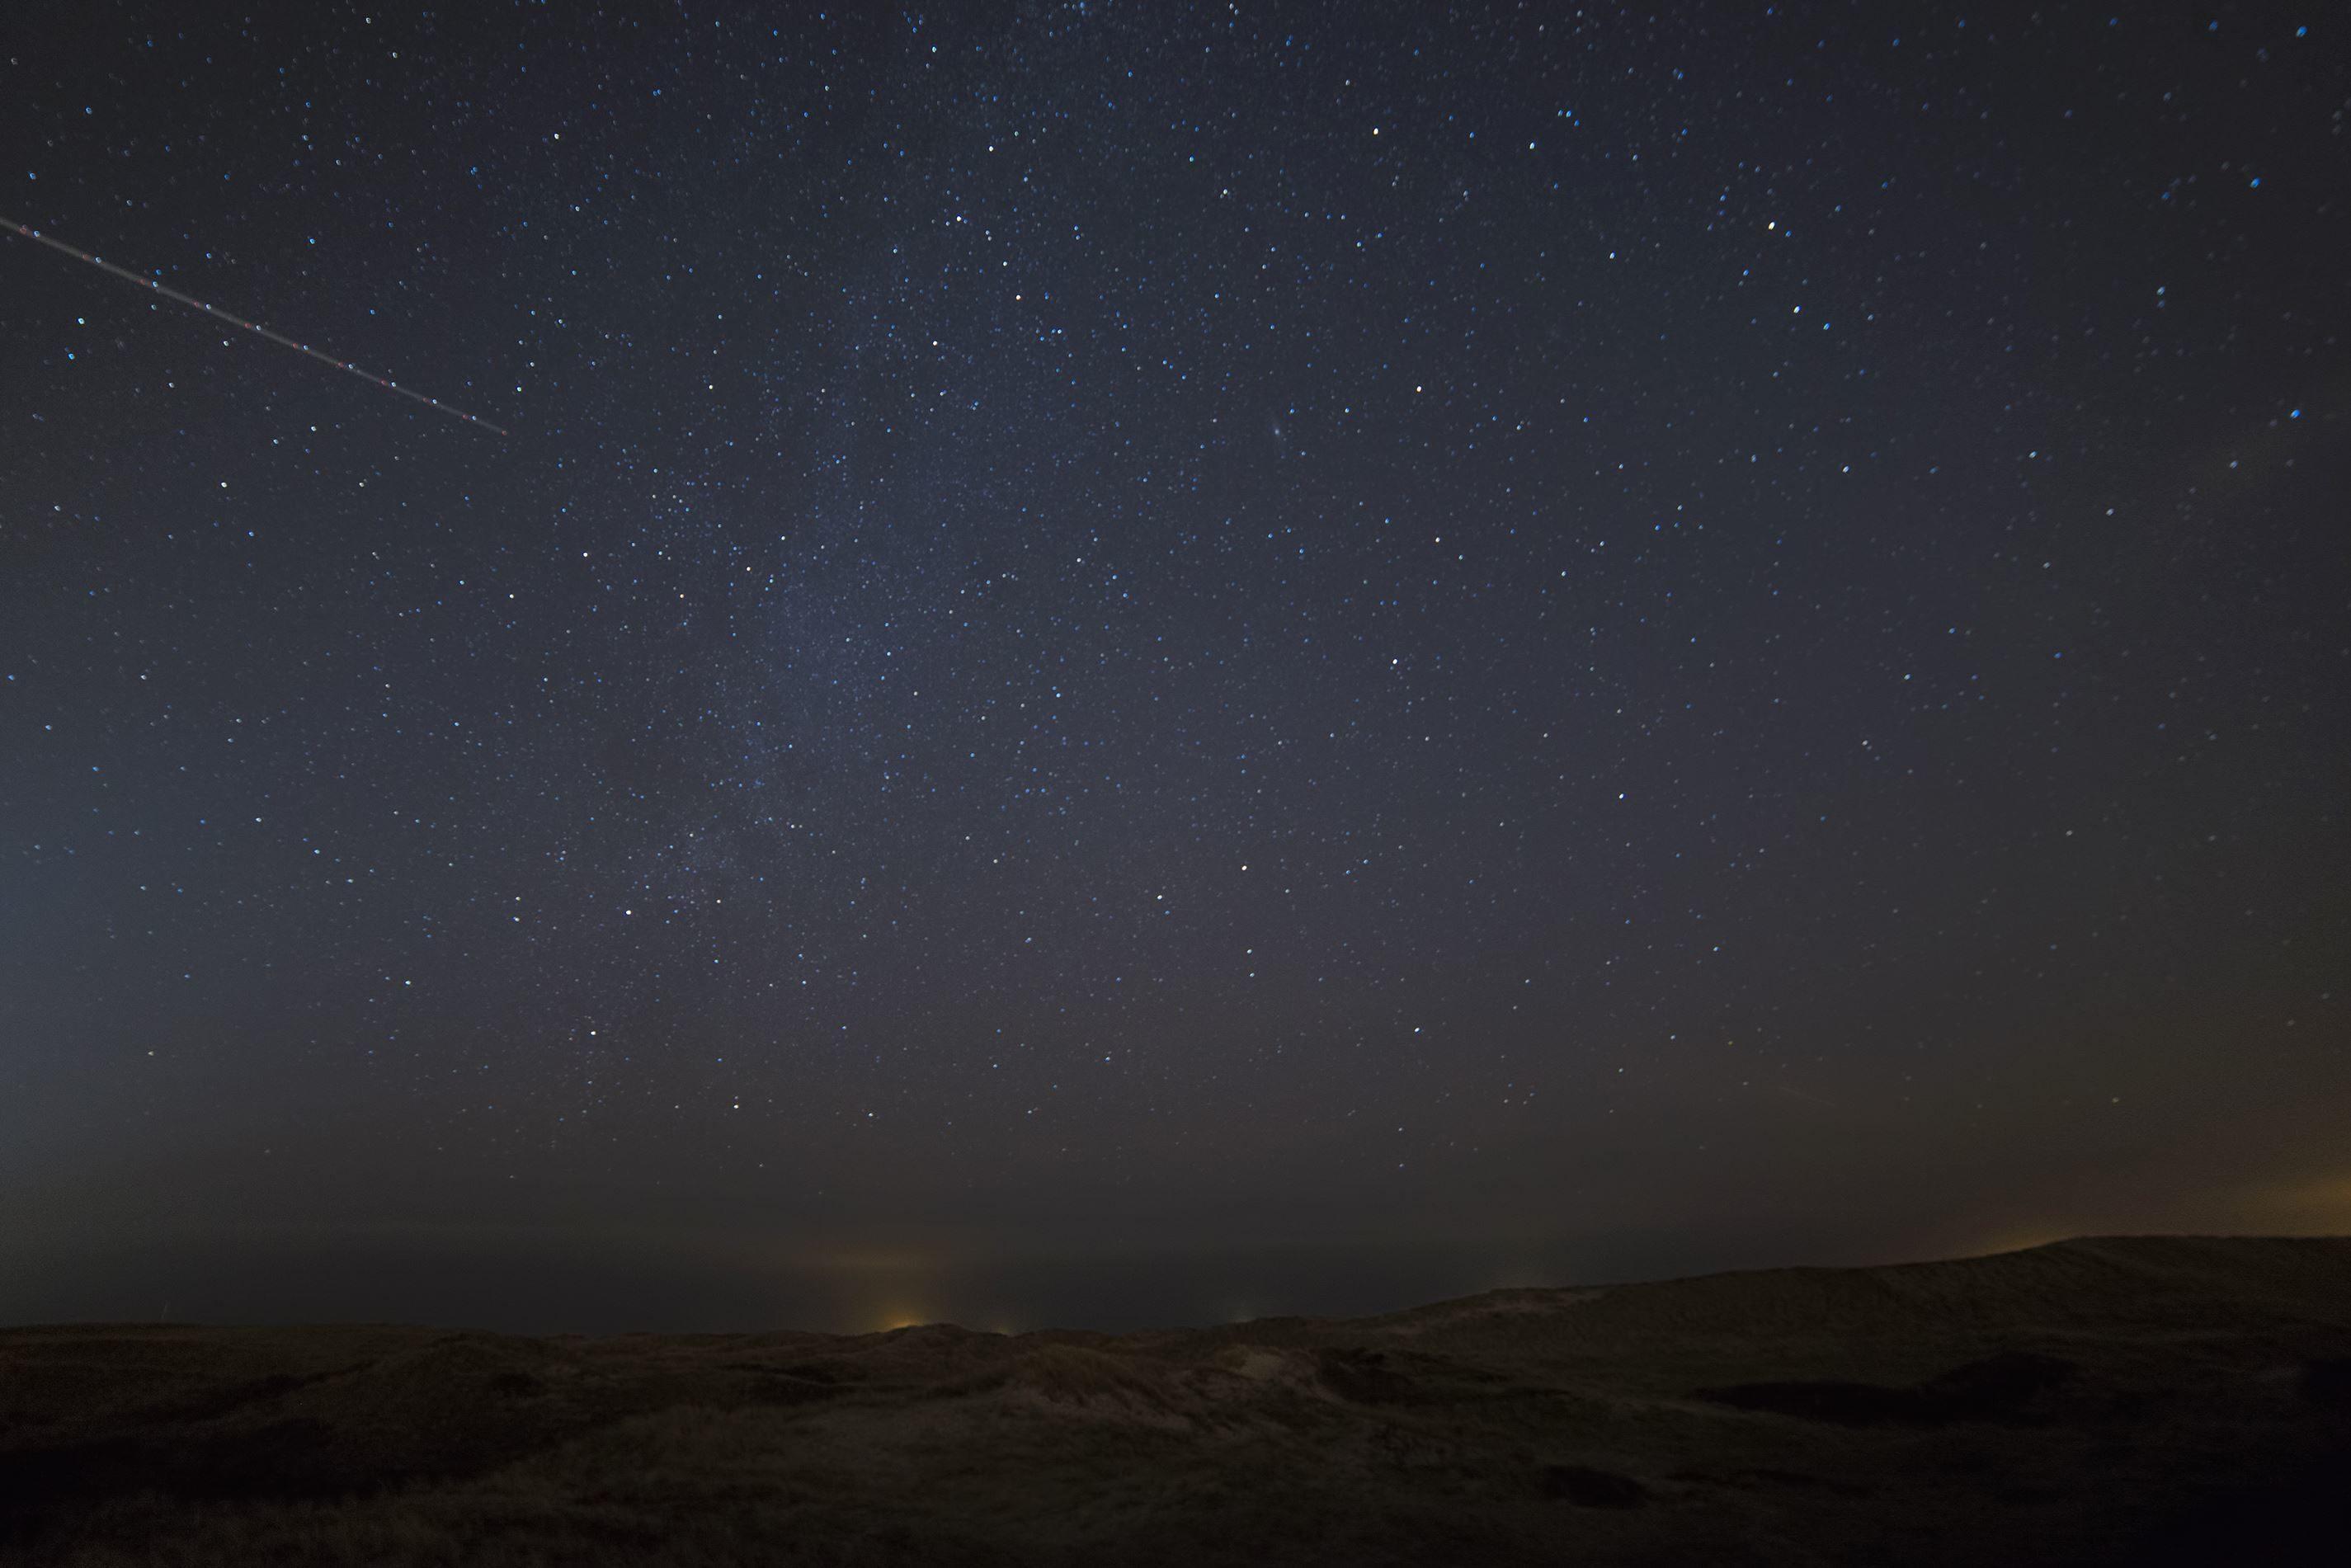 free picture  star  sky  dark  galaxy  night